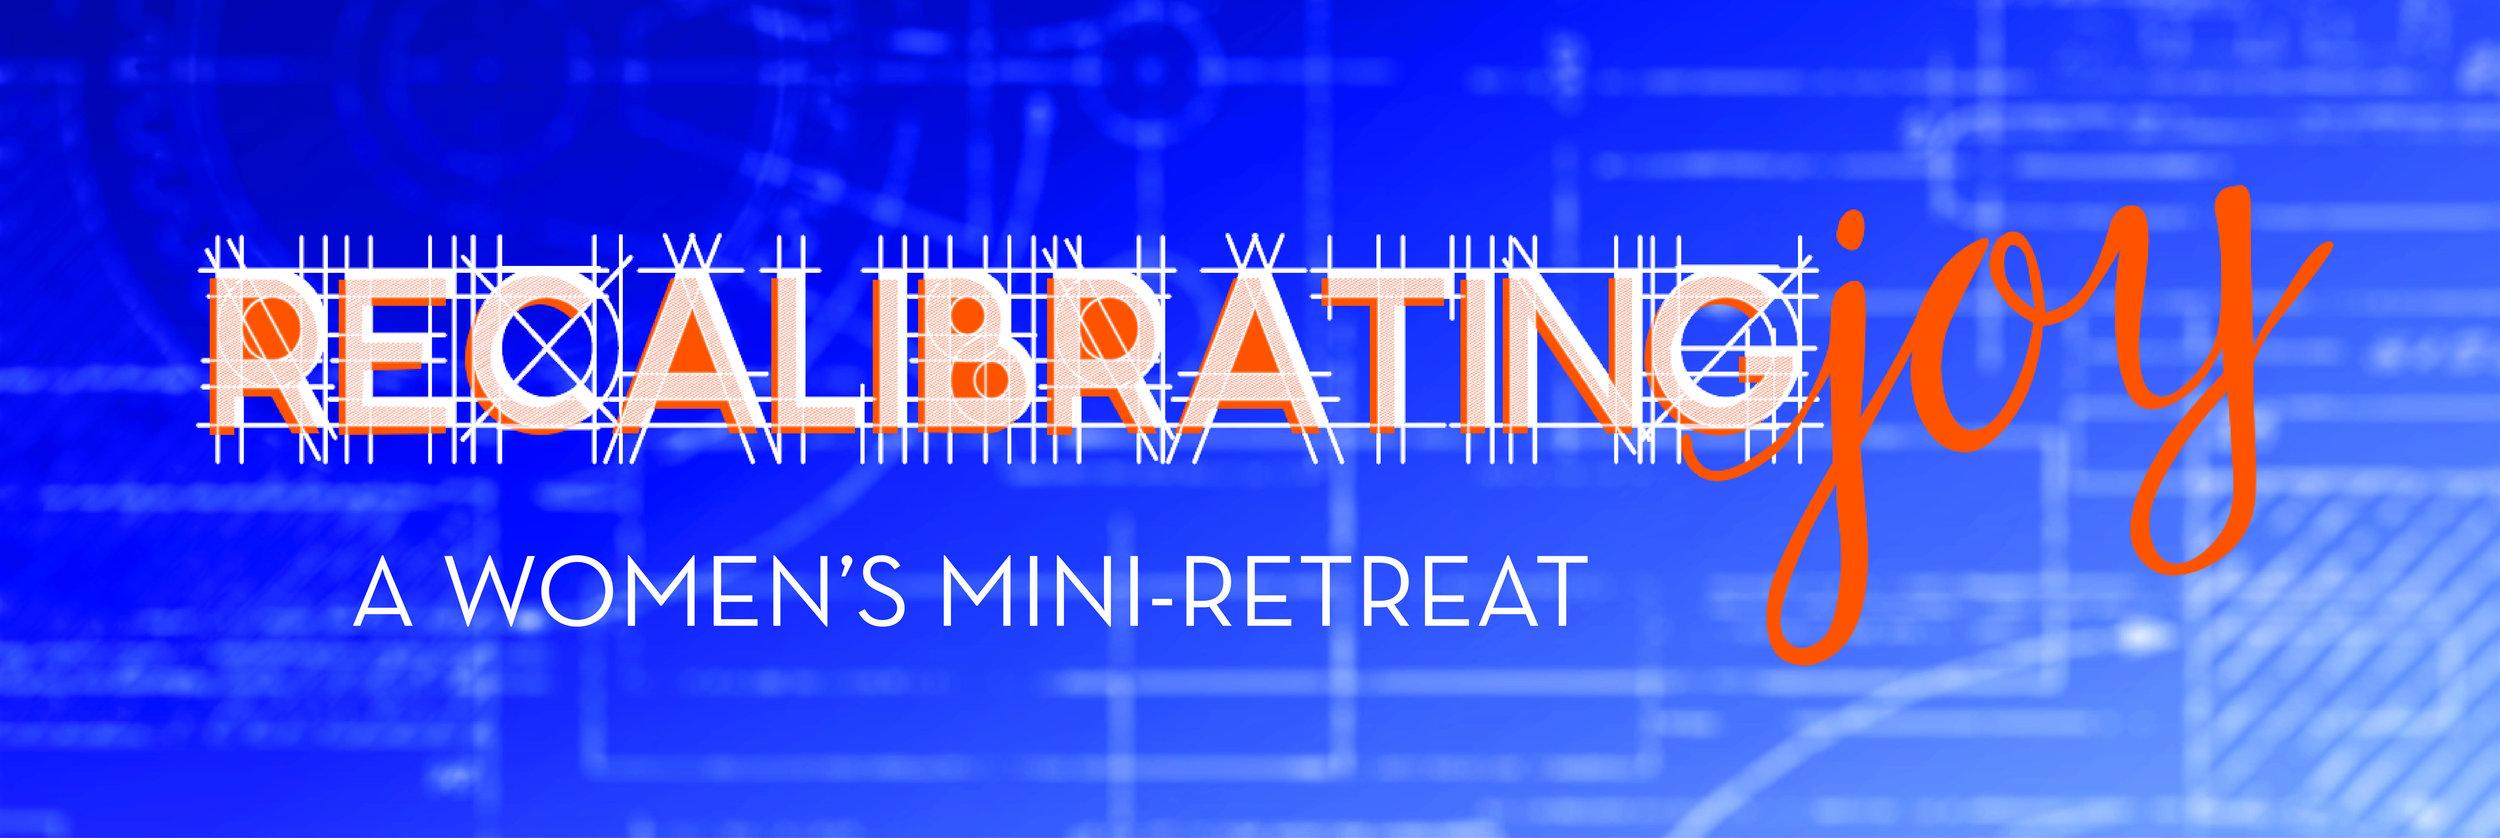 Fall 2019 Mini Retreat Banner.jpg